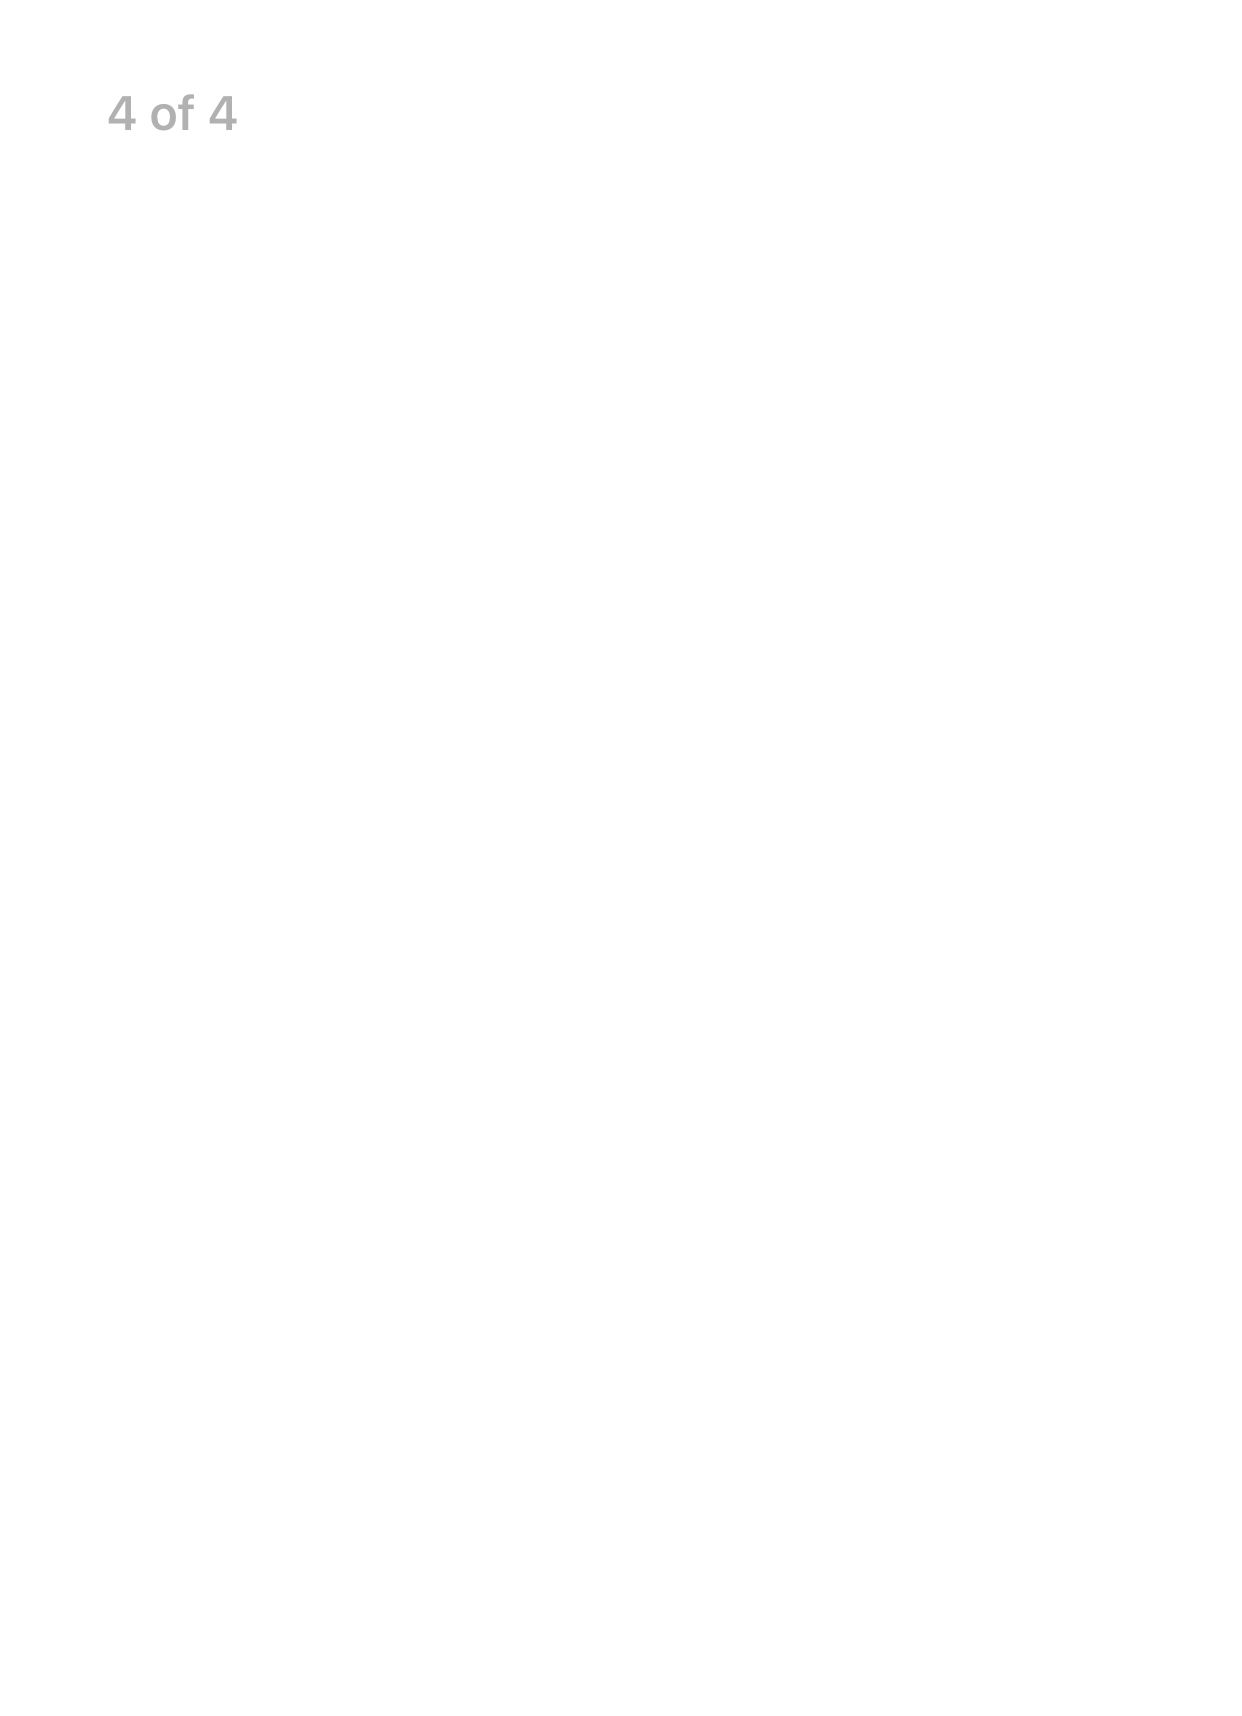 Titik R Worksheet   Printable Worksheets and Activities for Teachers [ 1716 x 1242 Pixel ]